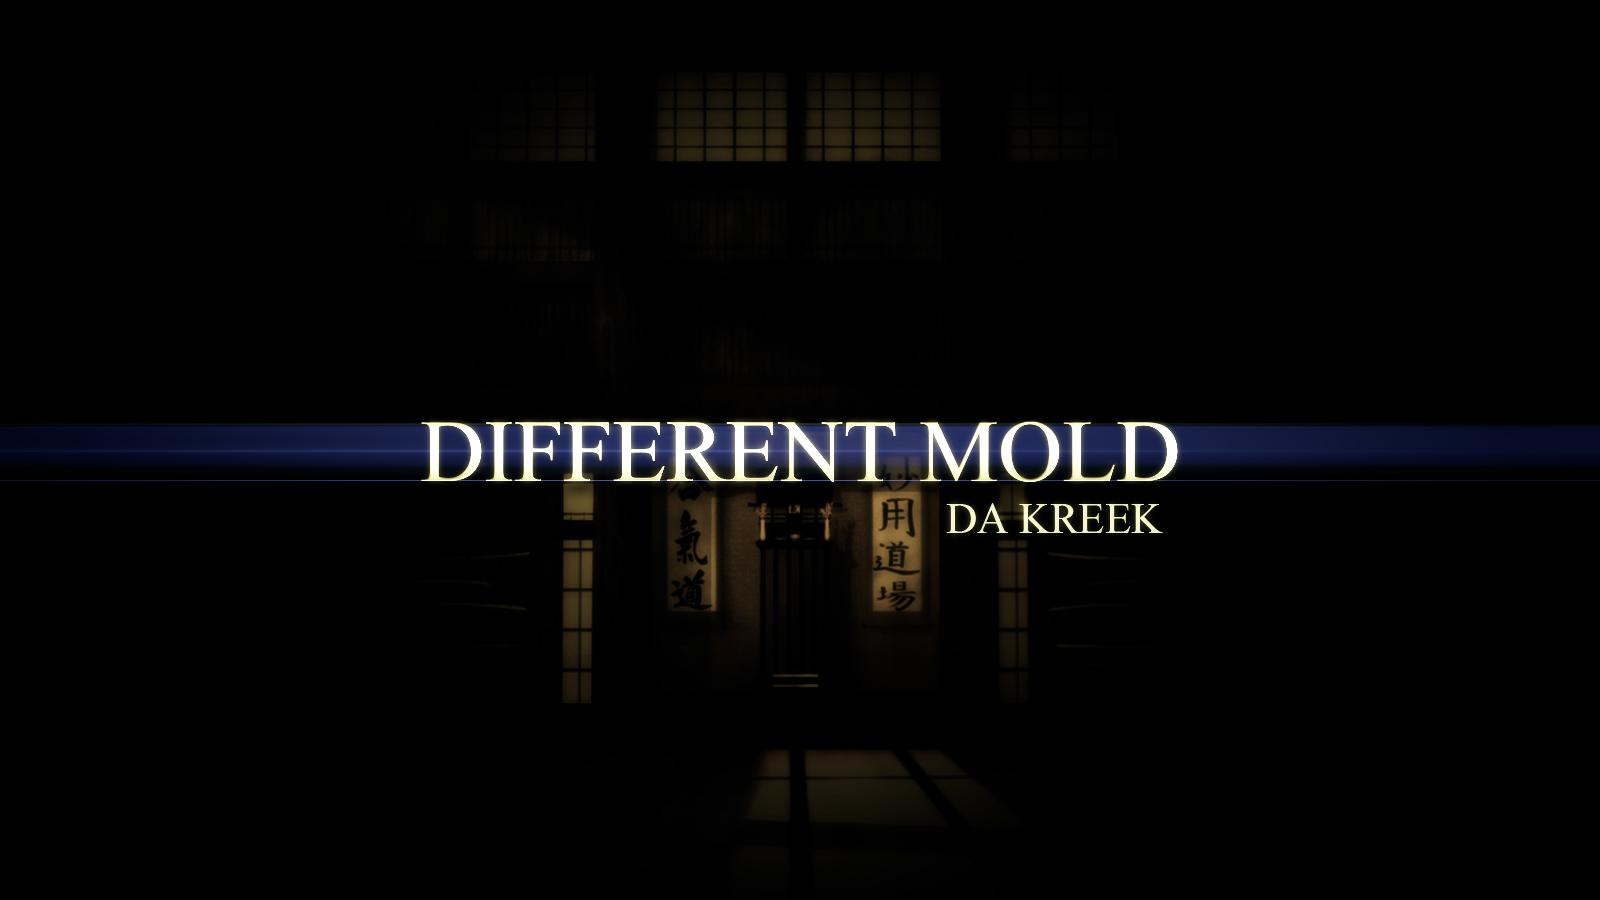 differentmold